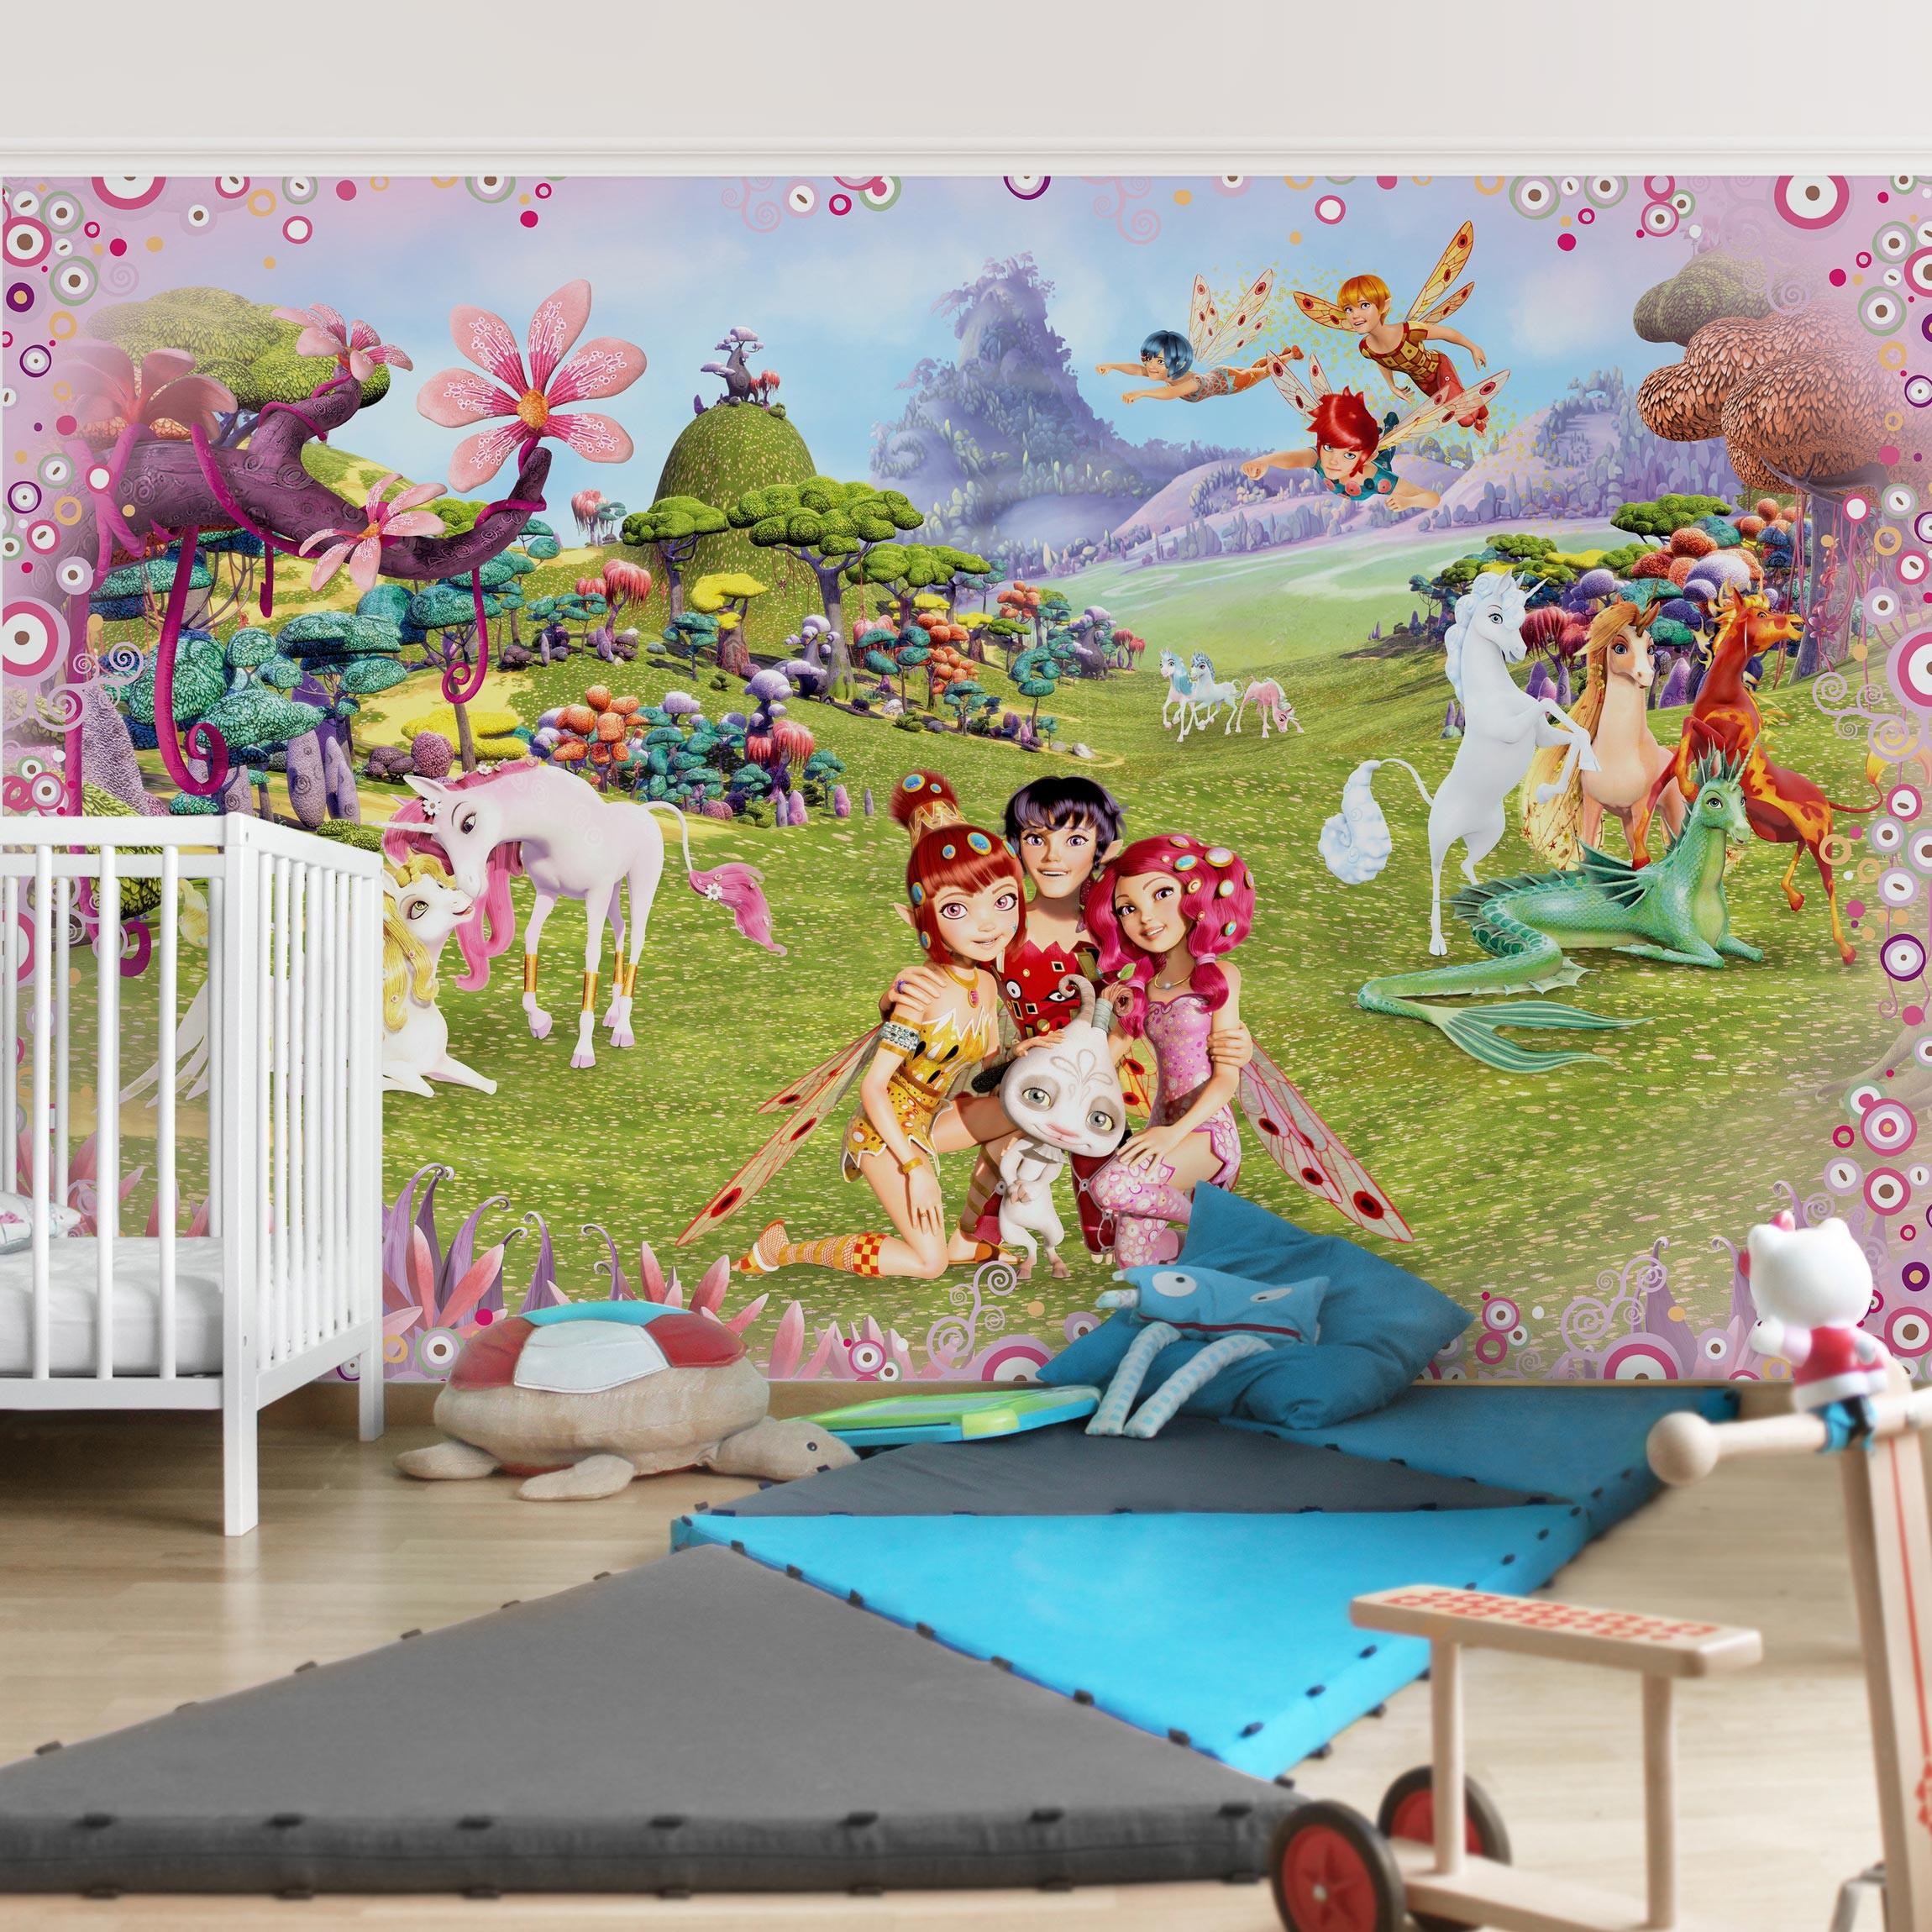 Kindertapete selbstklebend - Mia and Me - Mia´s magische Welt